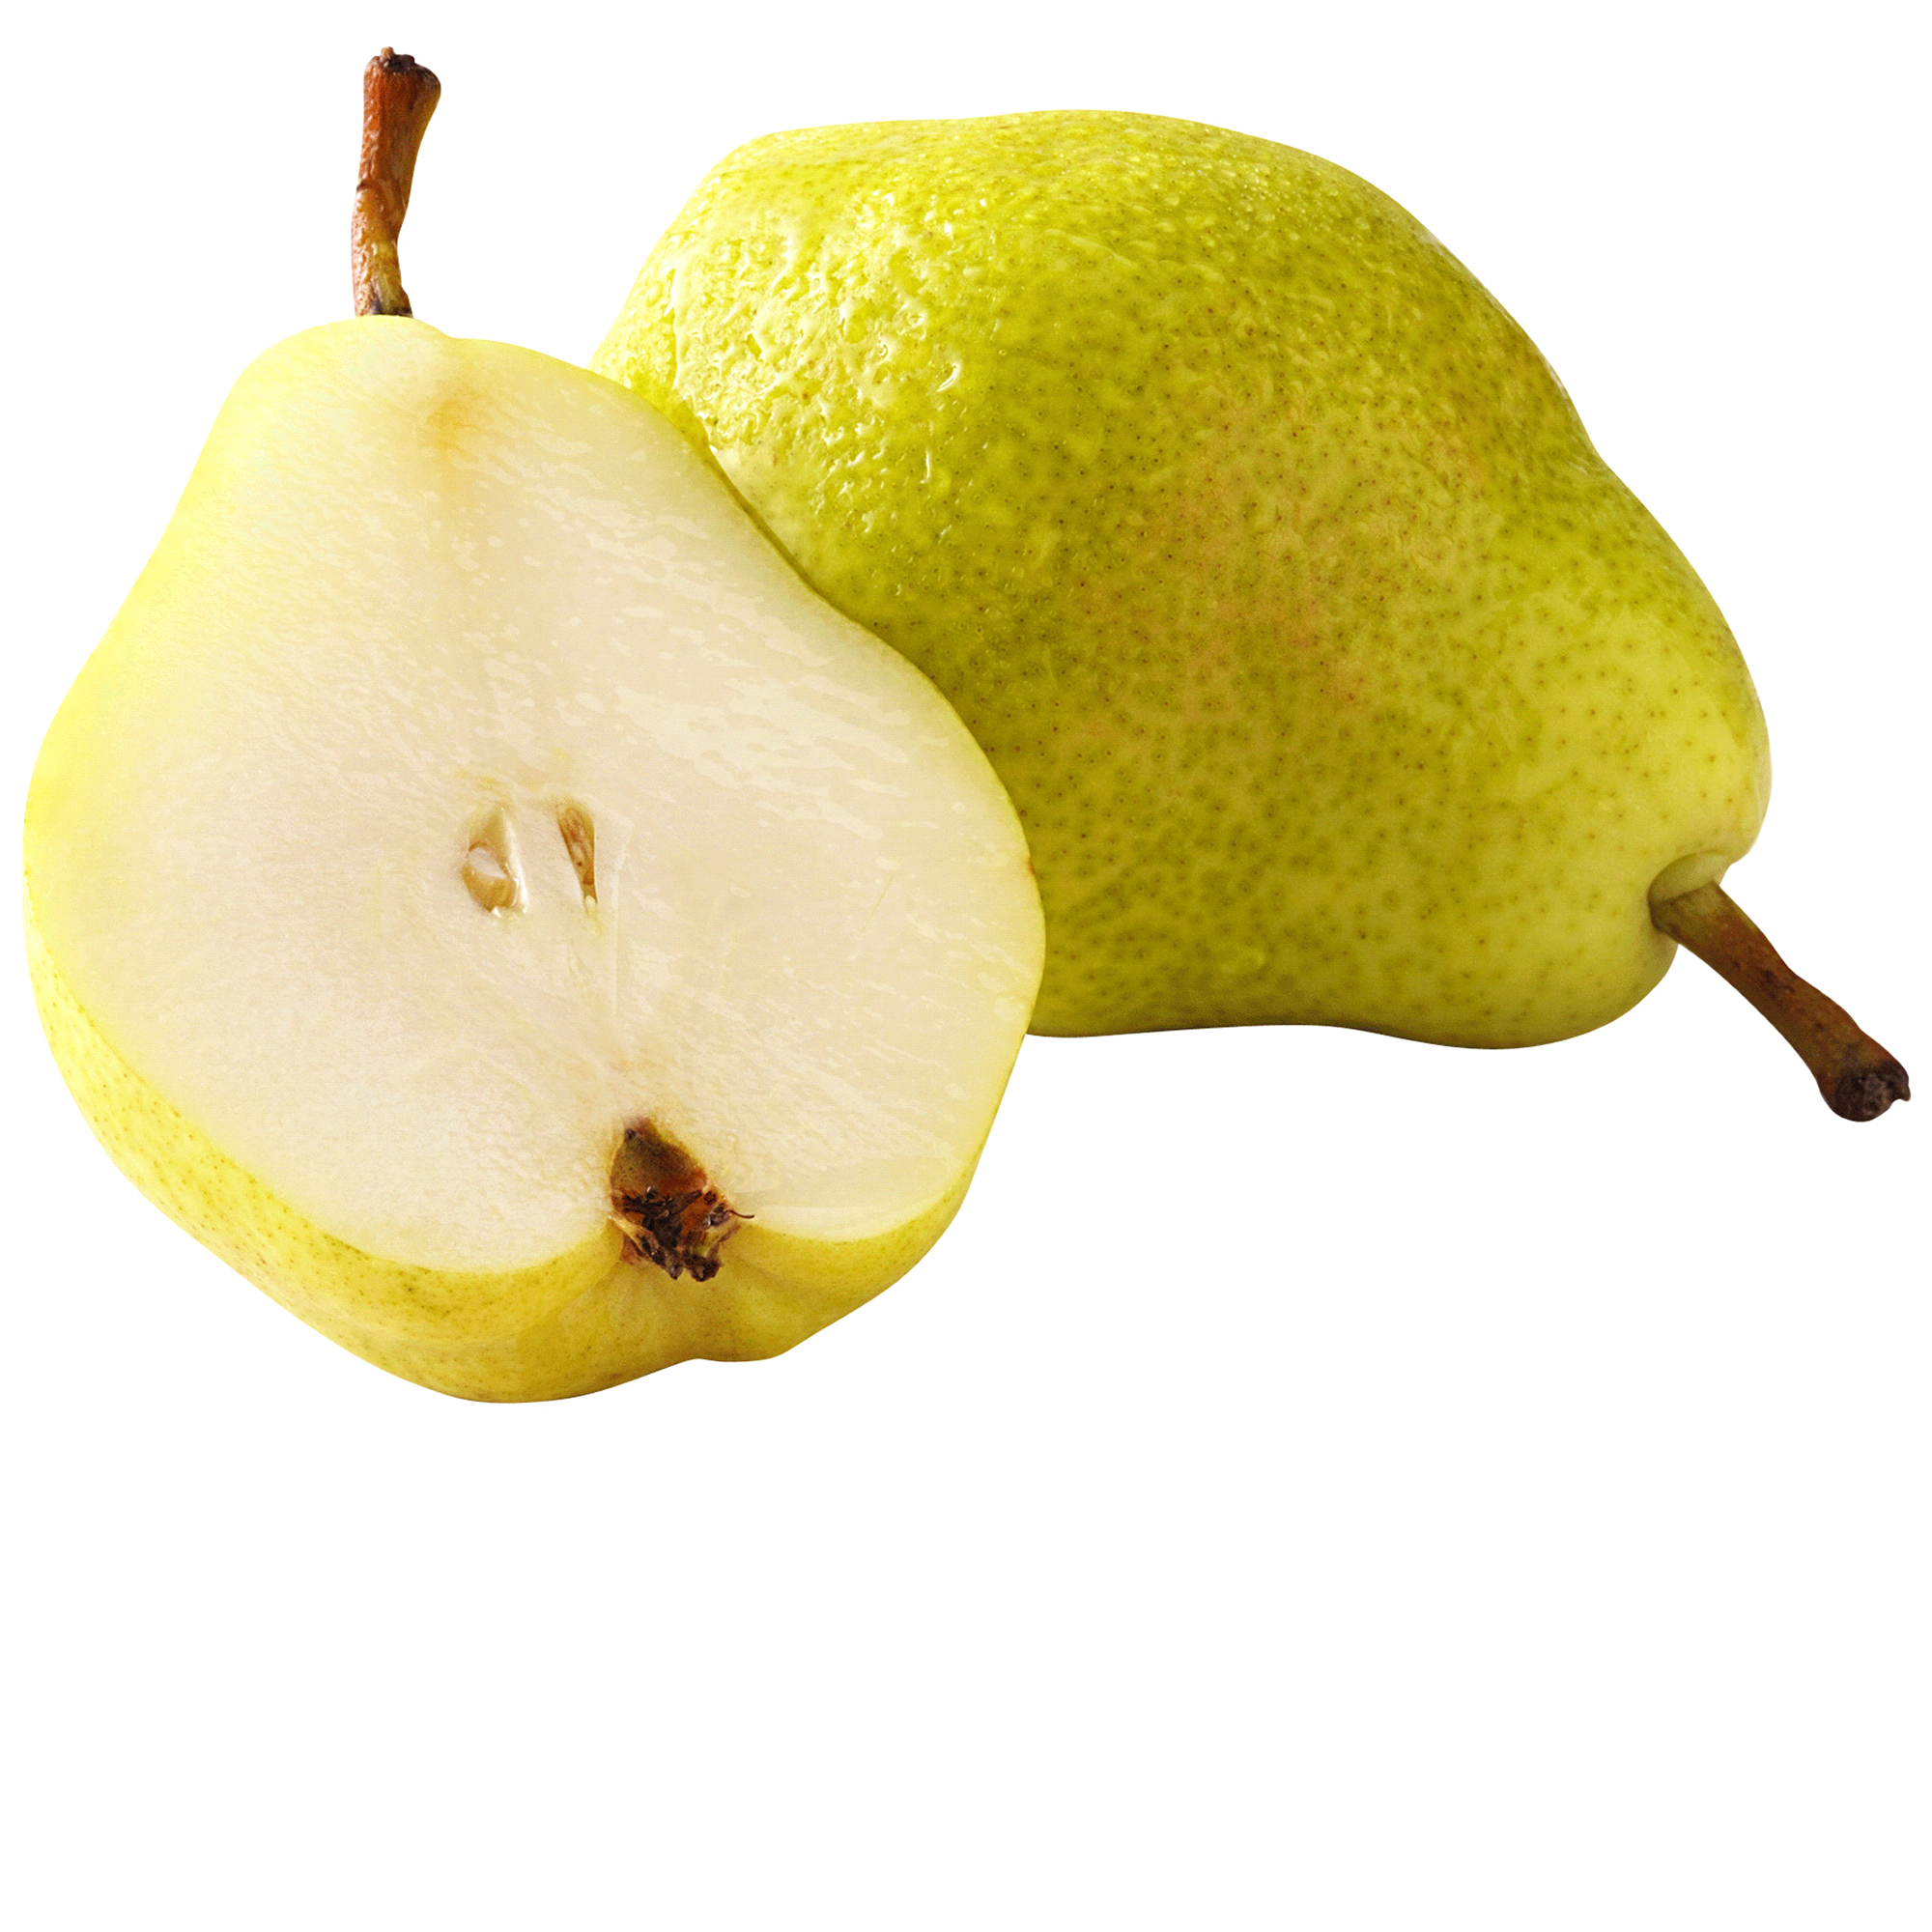 Pears   Meijer.com